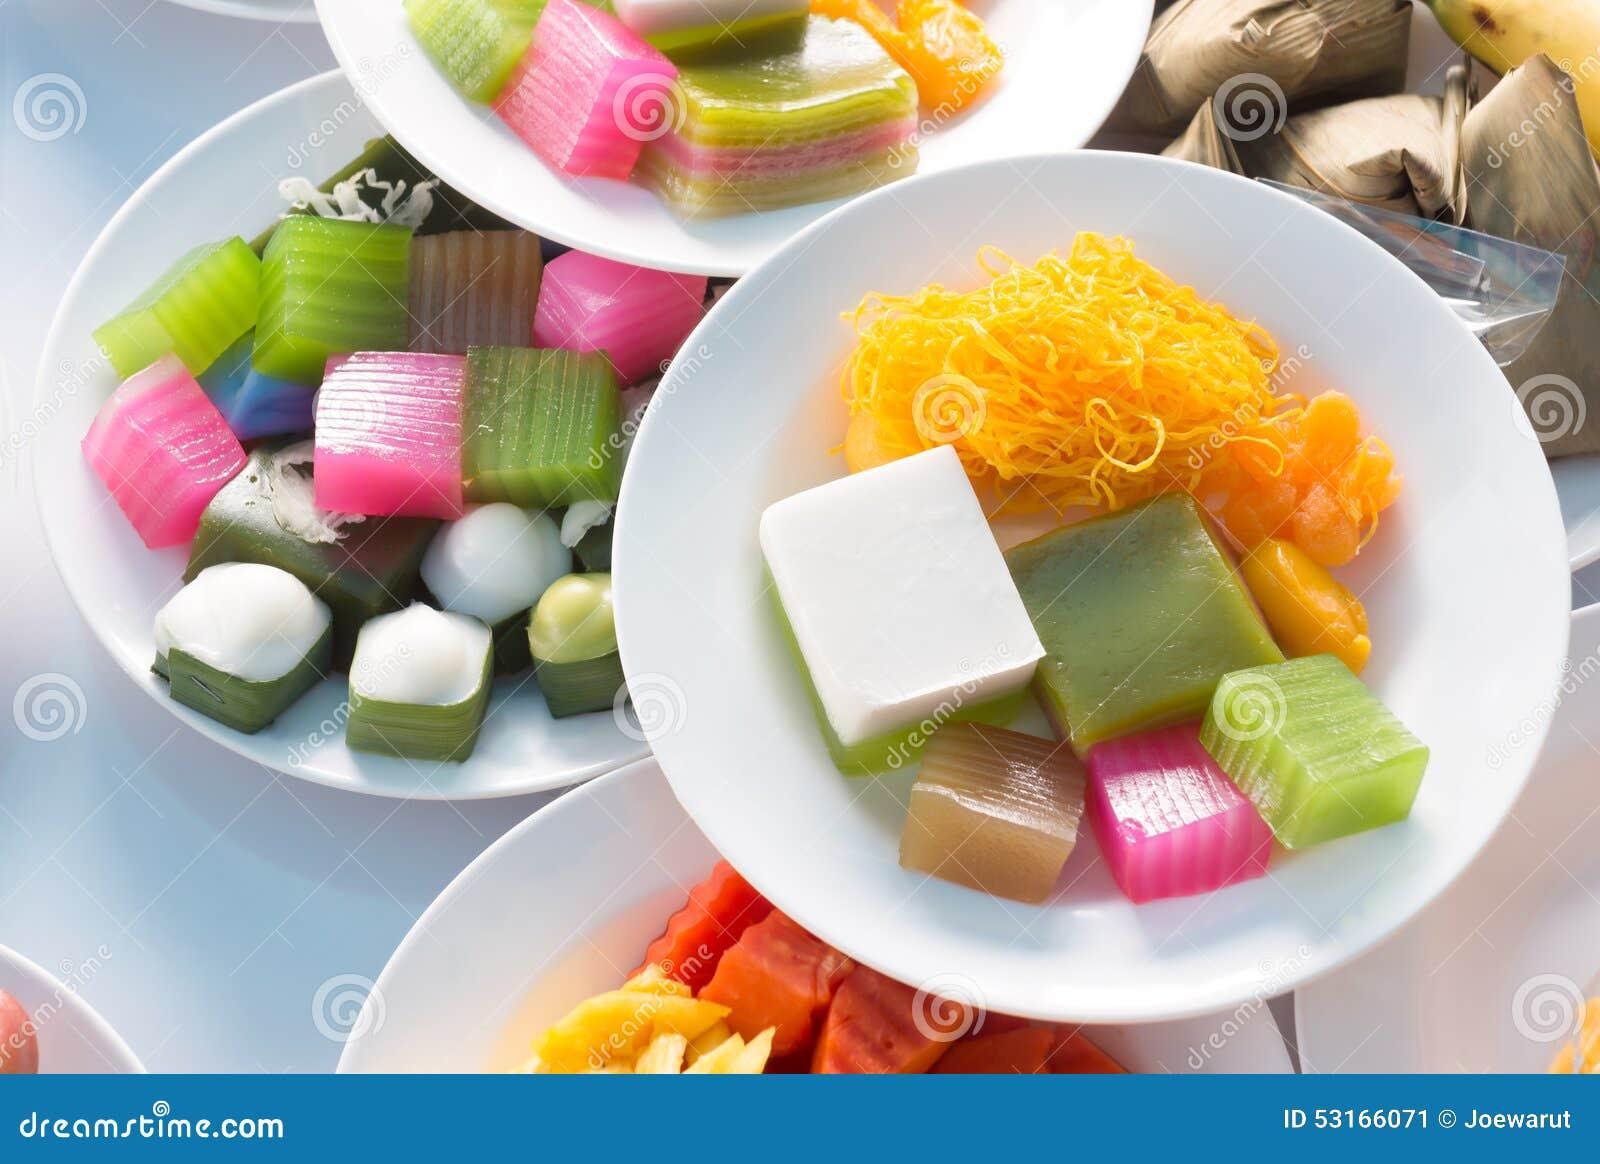 Sobremesa tailandesa